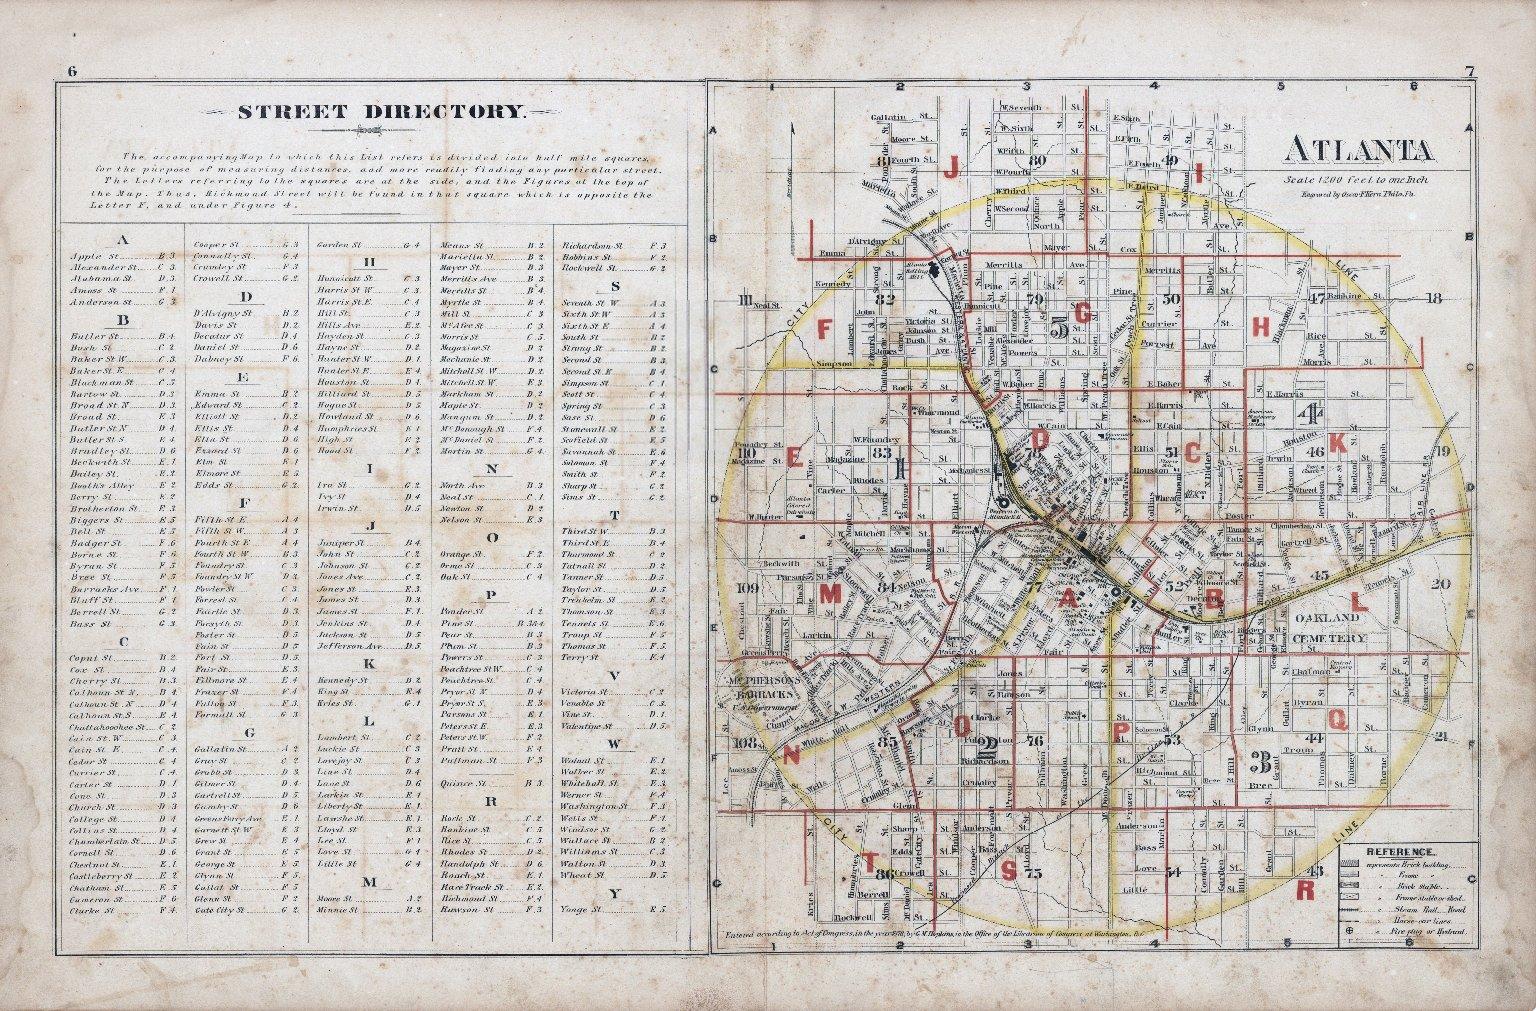 Street Directory: Atlanta